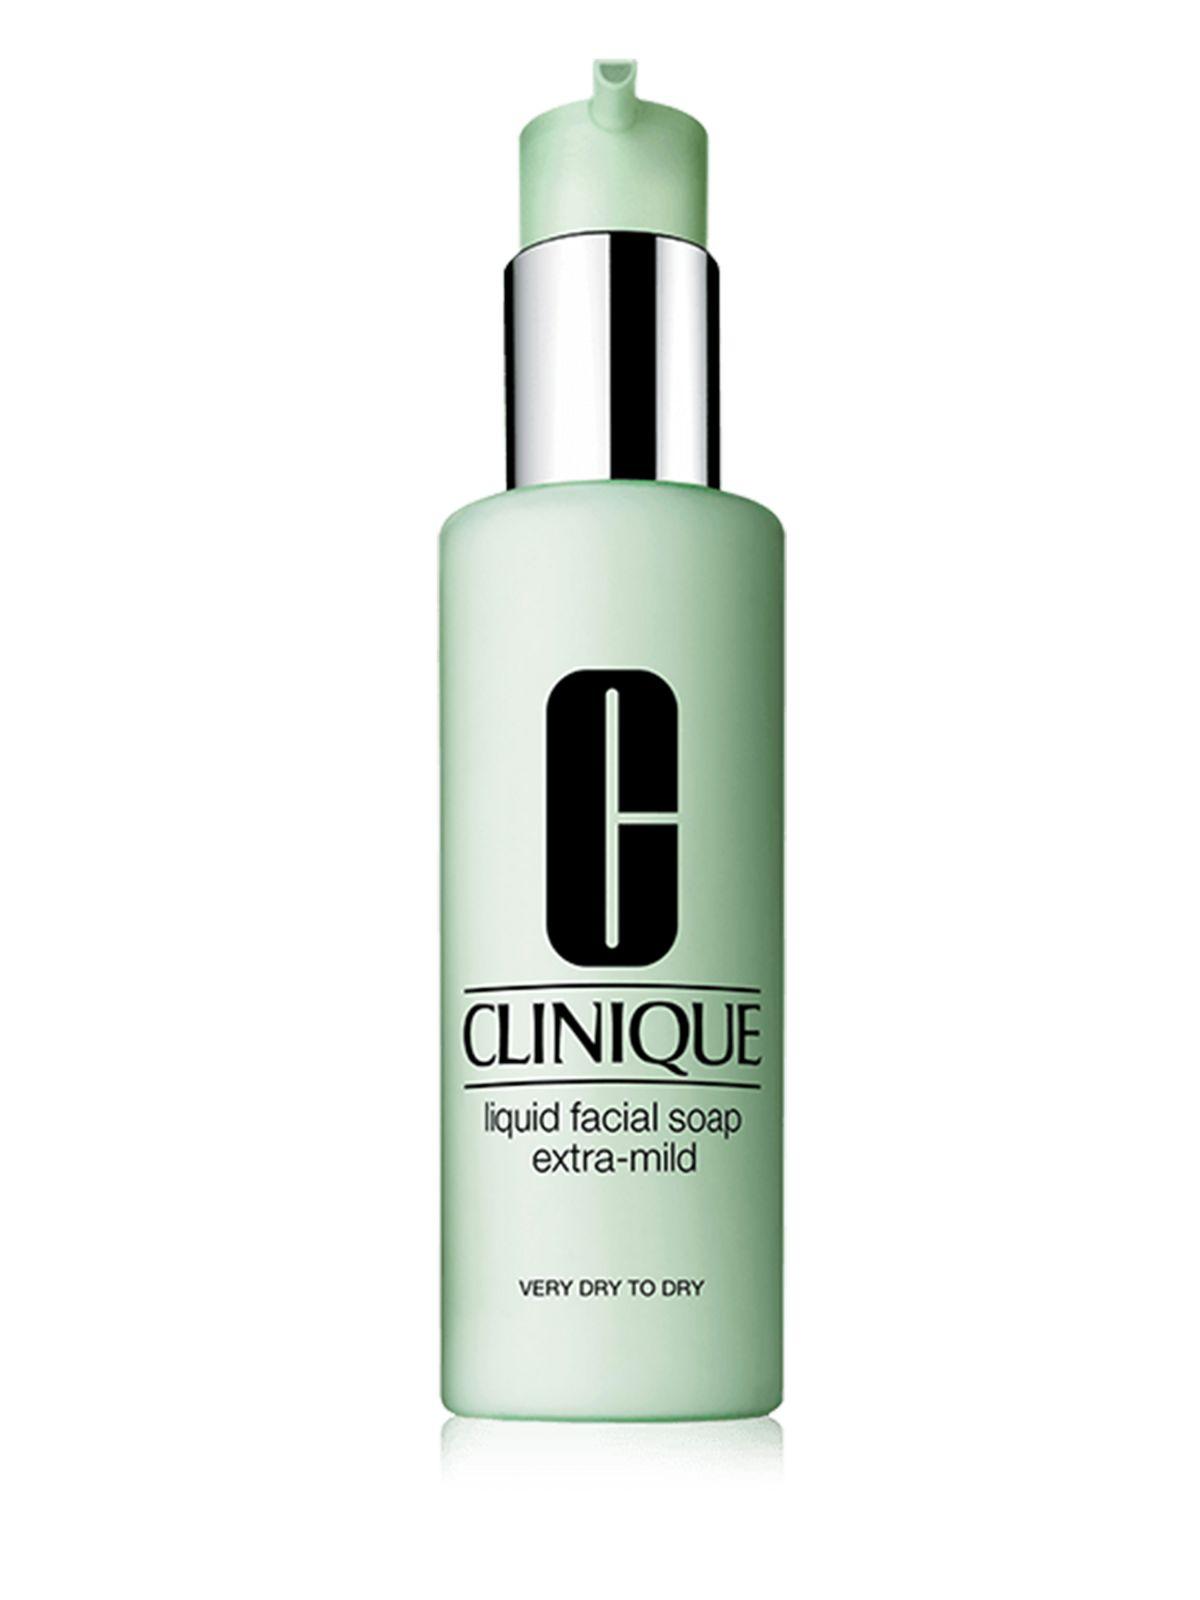 סבון פנים נוזלי לעור יבש ויבש מאוד EXTRA MILDסבון פנים נוזלי לעור יבש ויבש מאוד EXTRA MILD של CLINIQUE